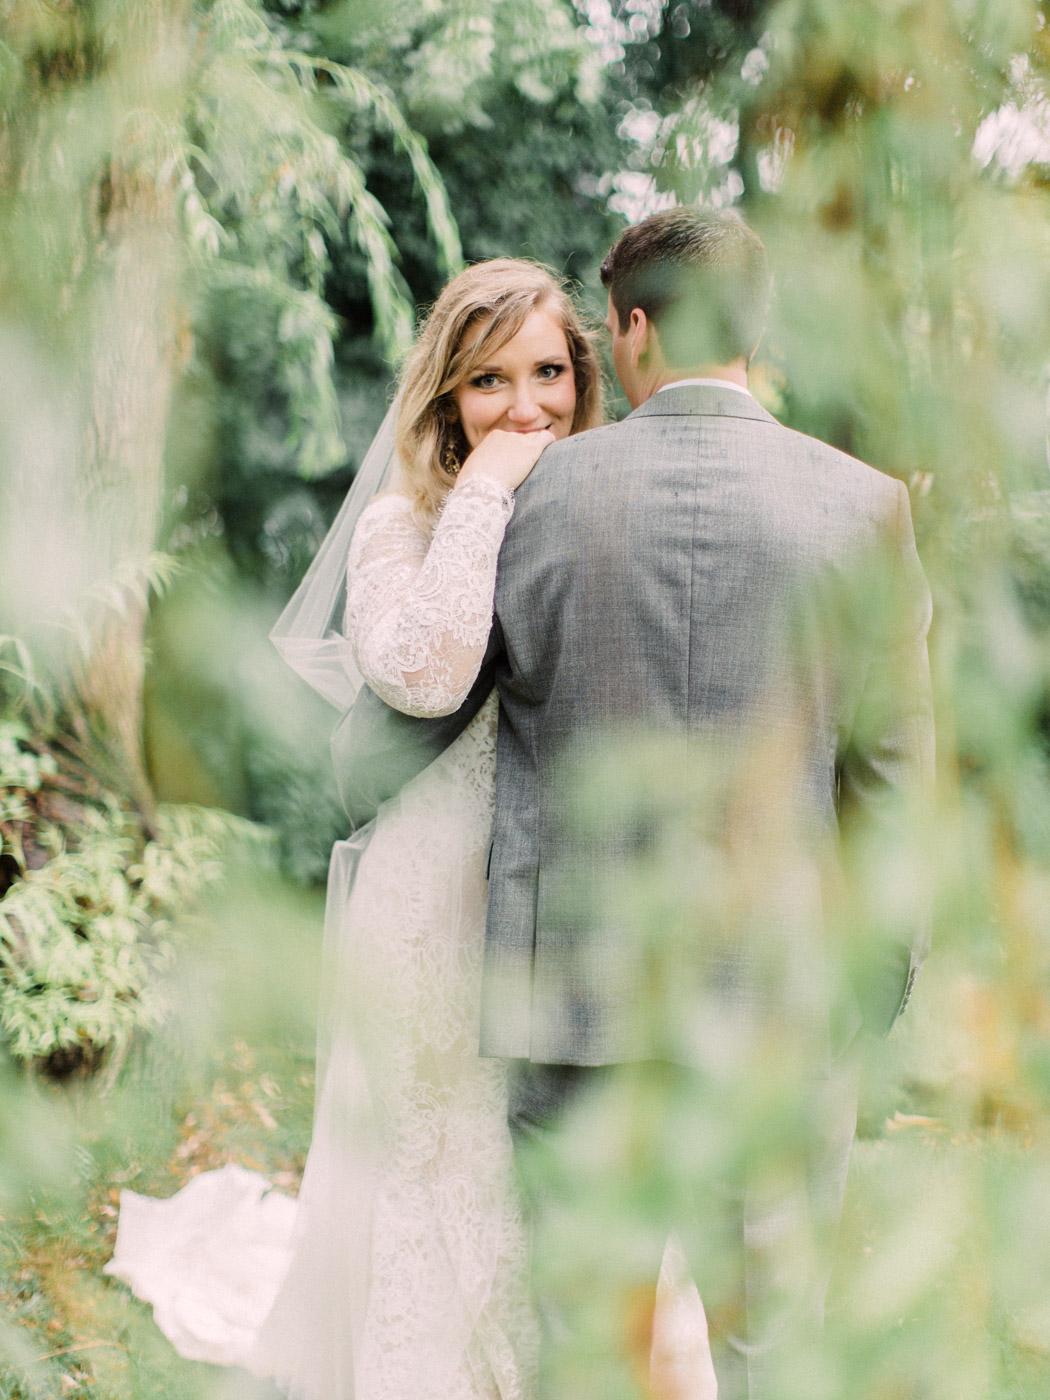 Toronto-wedding-photographer-intimate-classic-fine-art-elopement-ottawa66.jpg